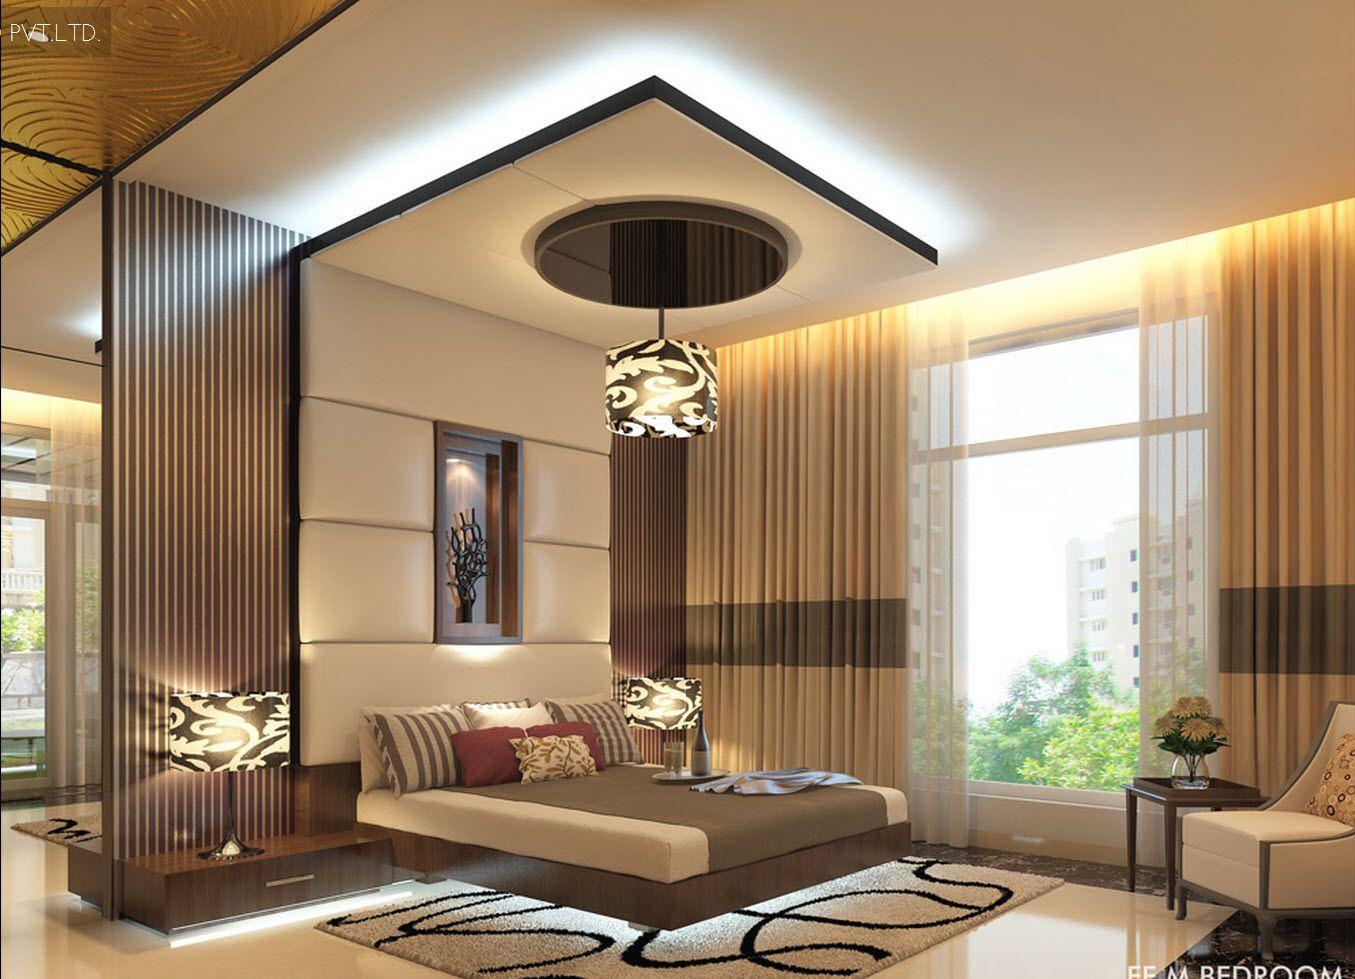 Pin by avijit das on interior | Bedroom false ceiling ...